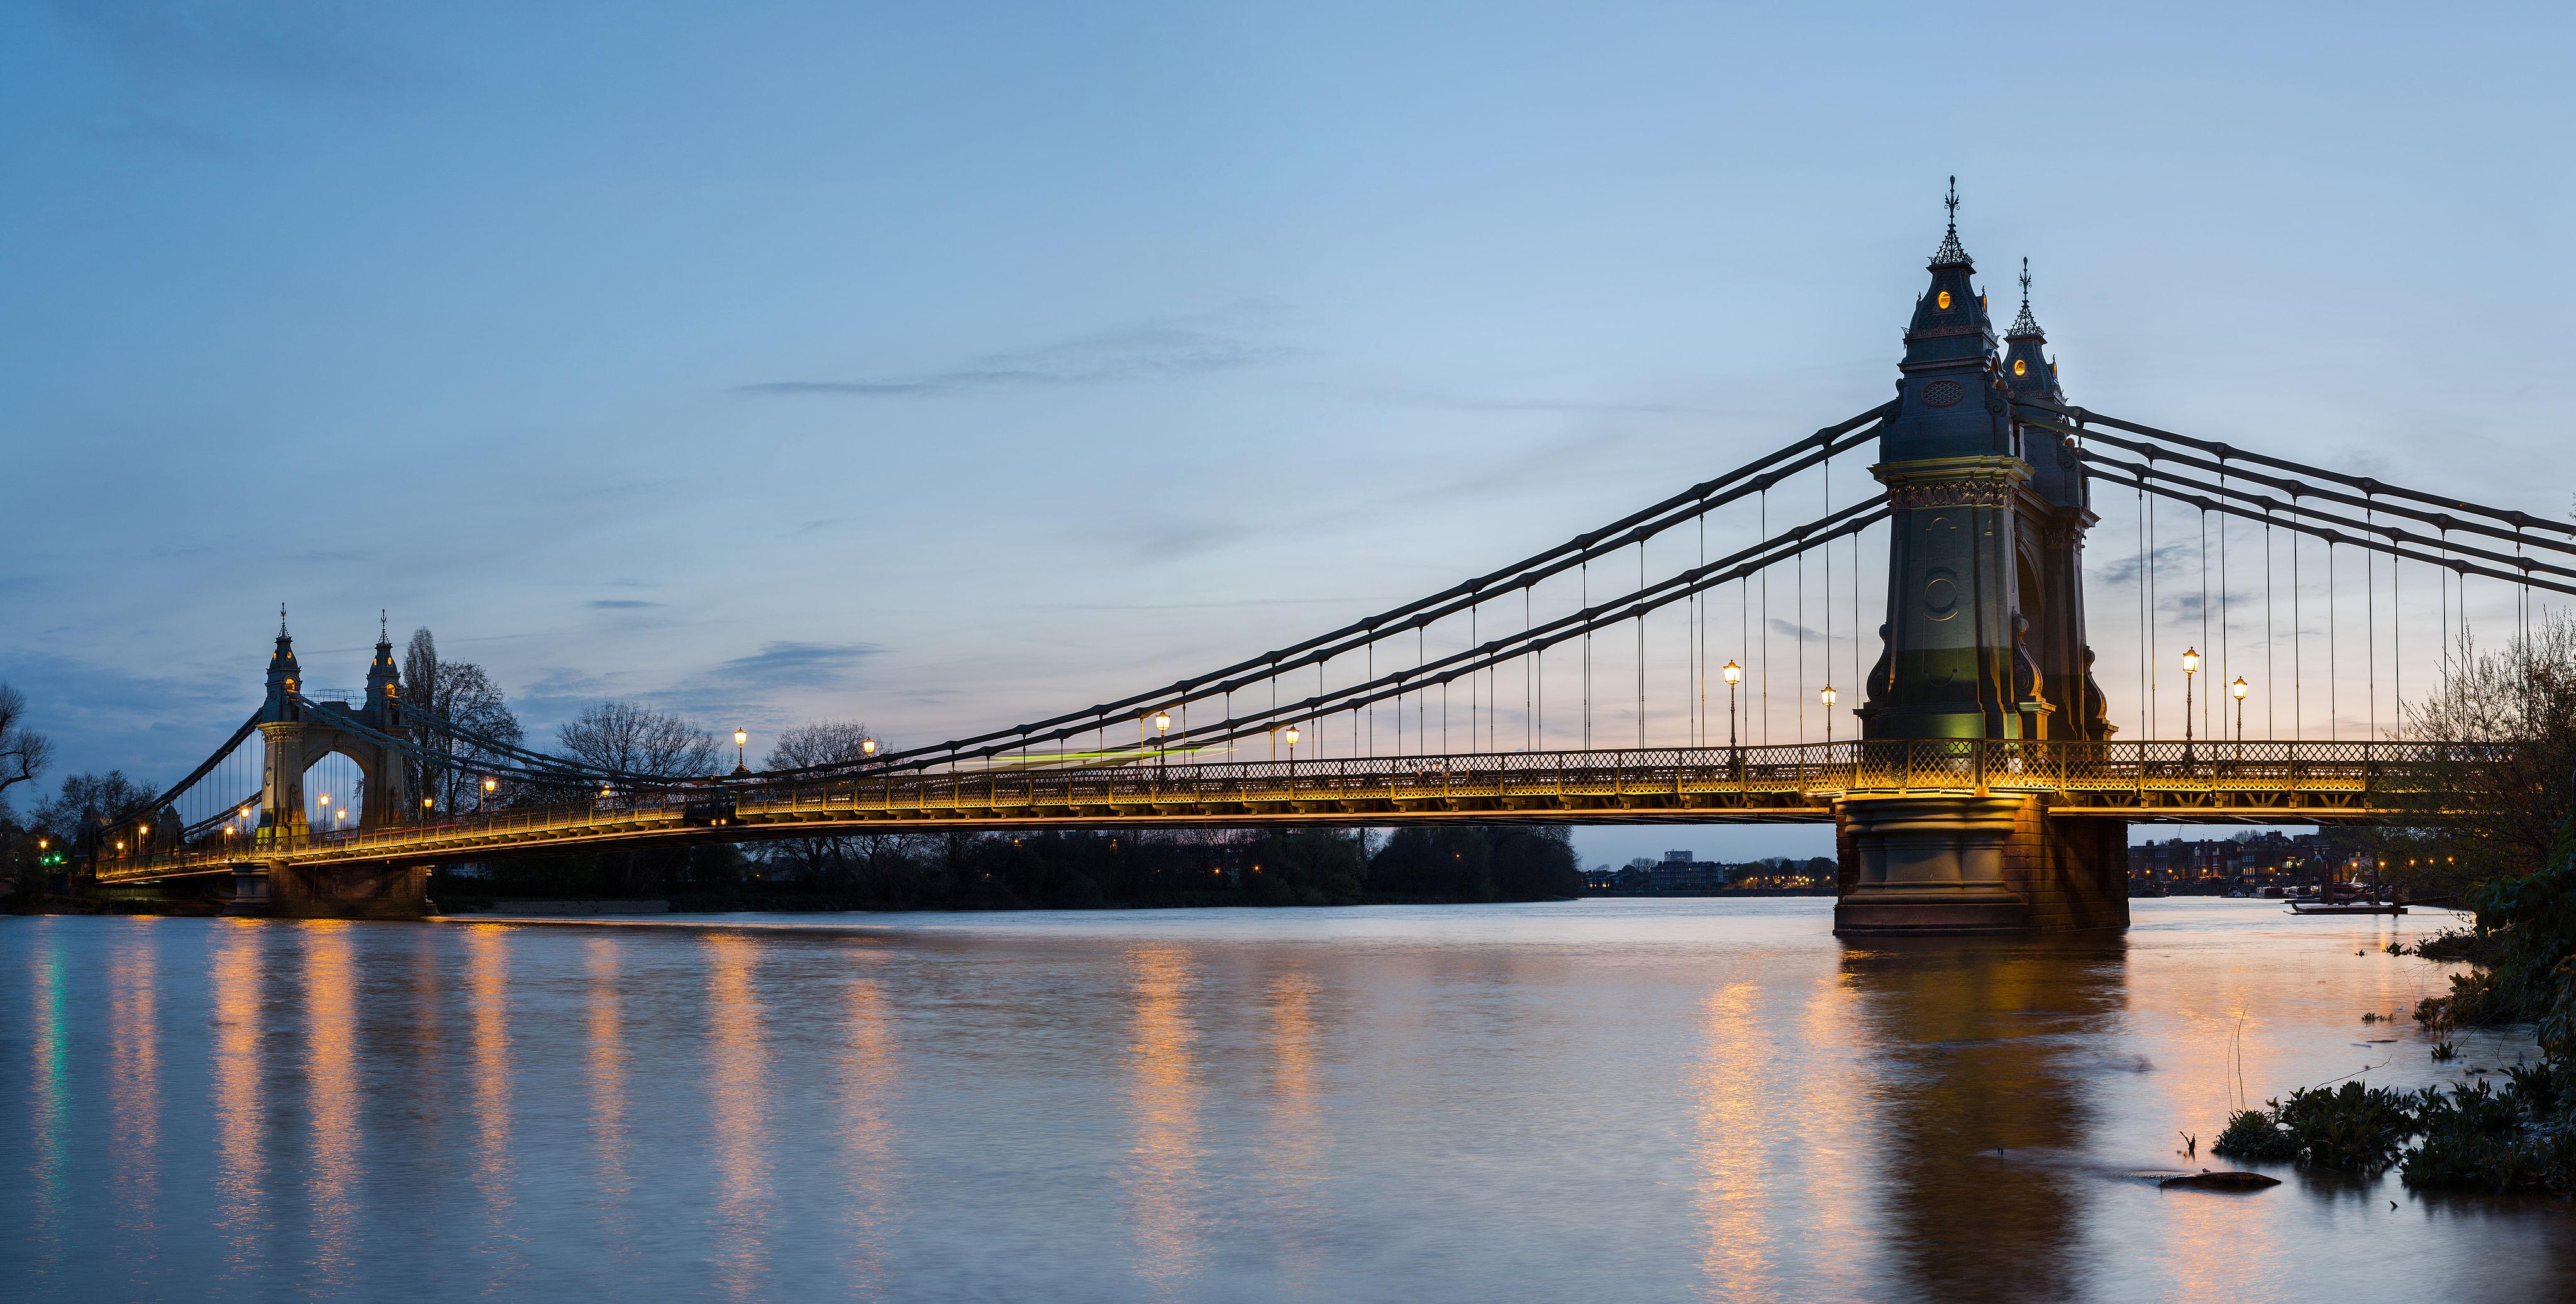 4096px-Hammersmith_Bridge_1,_London,_UK_-_April_2012.jpg